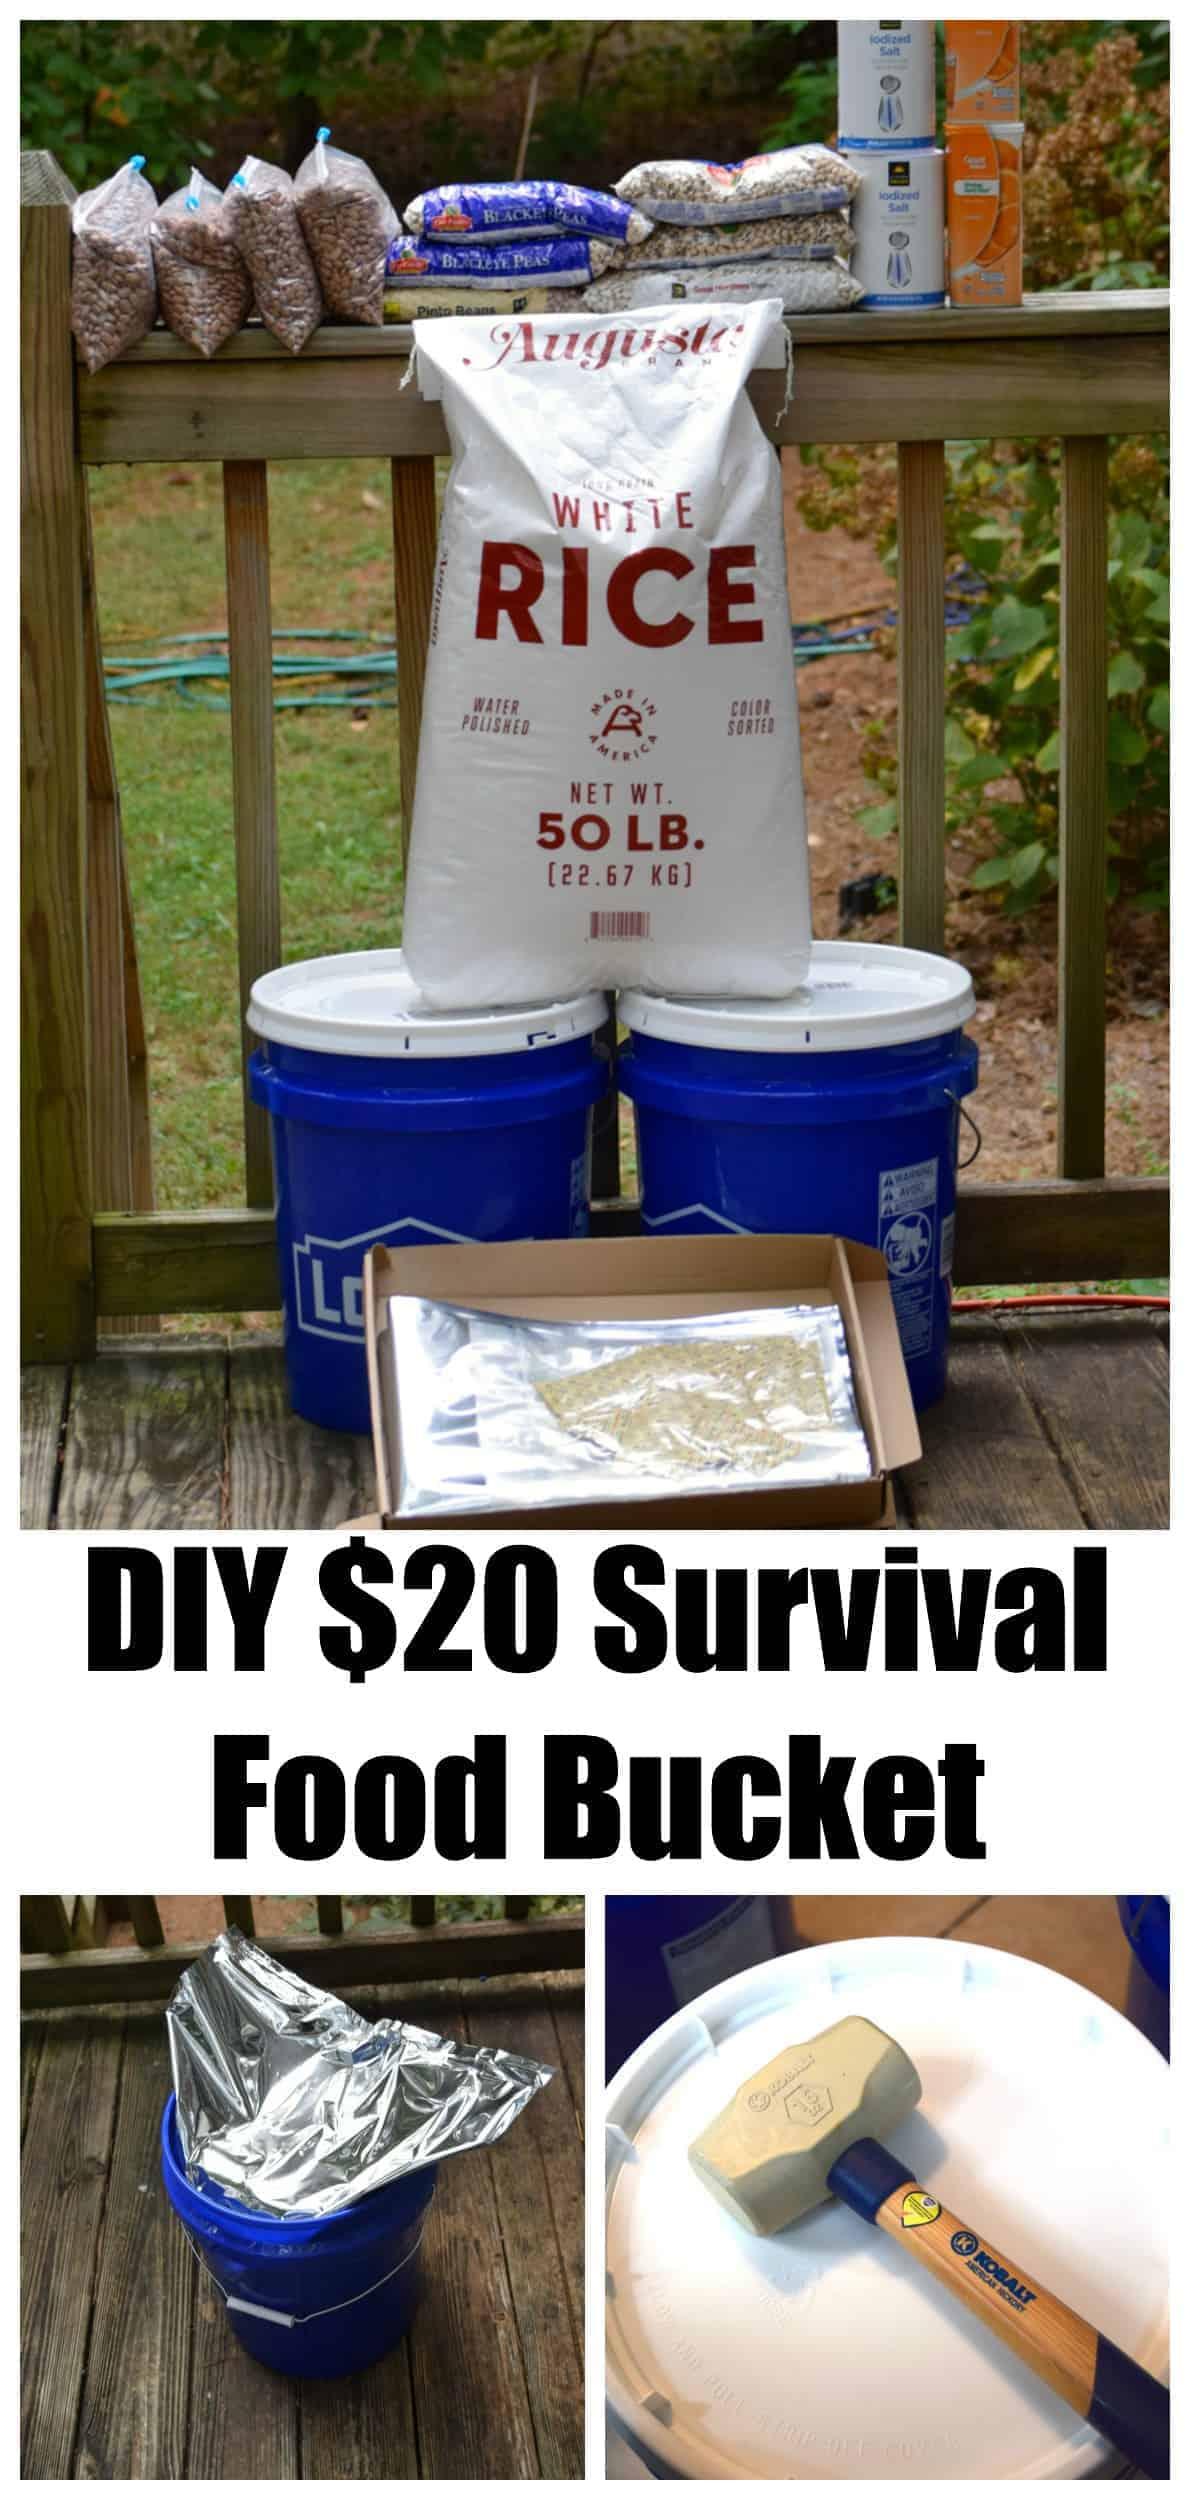 Diy 20 Survival Food Bucket Southern Plate